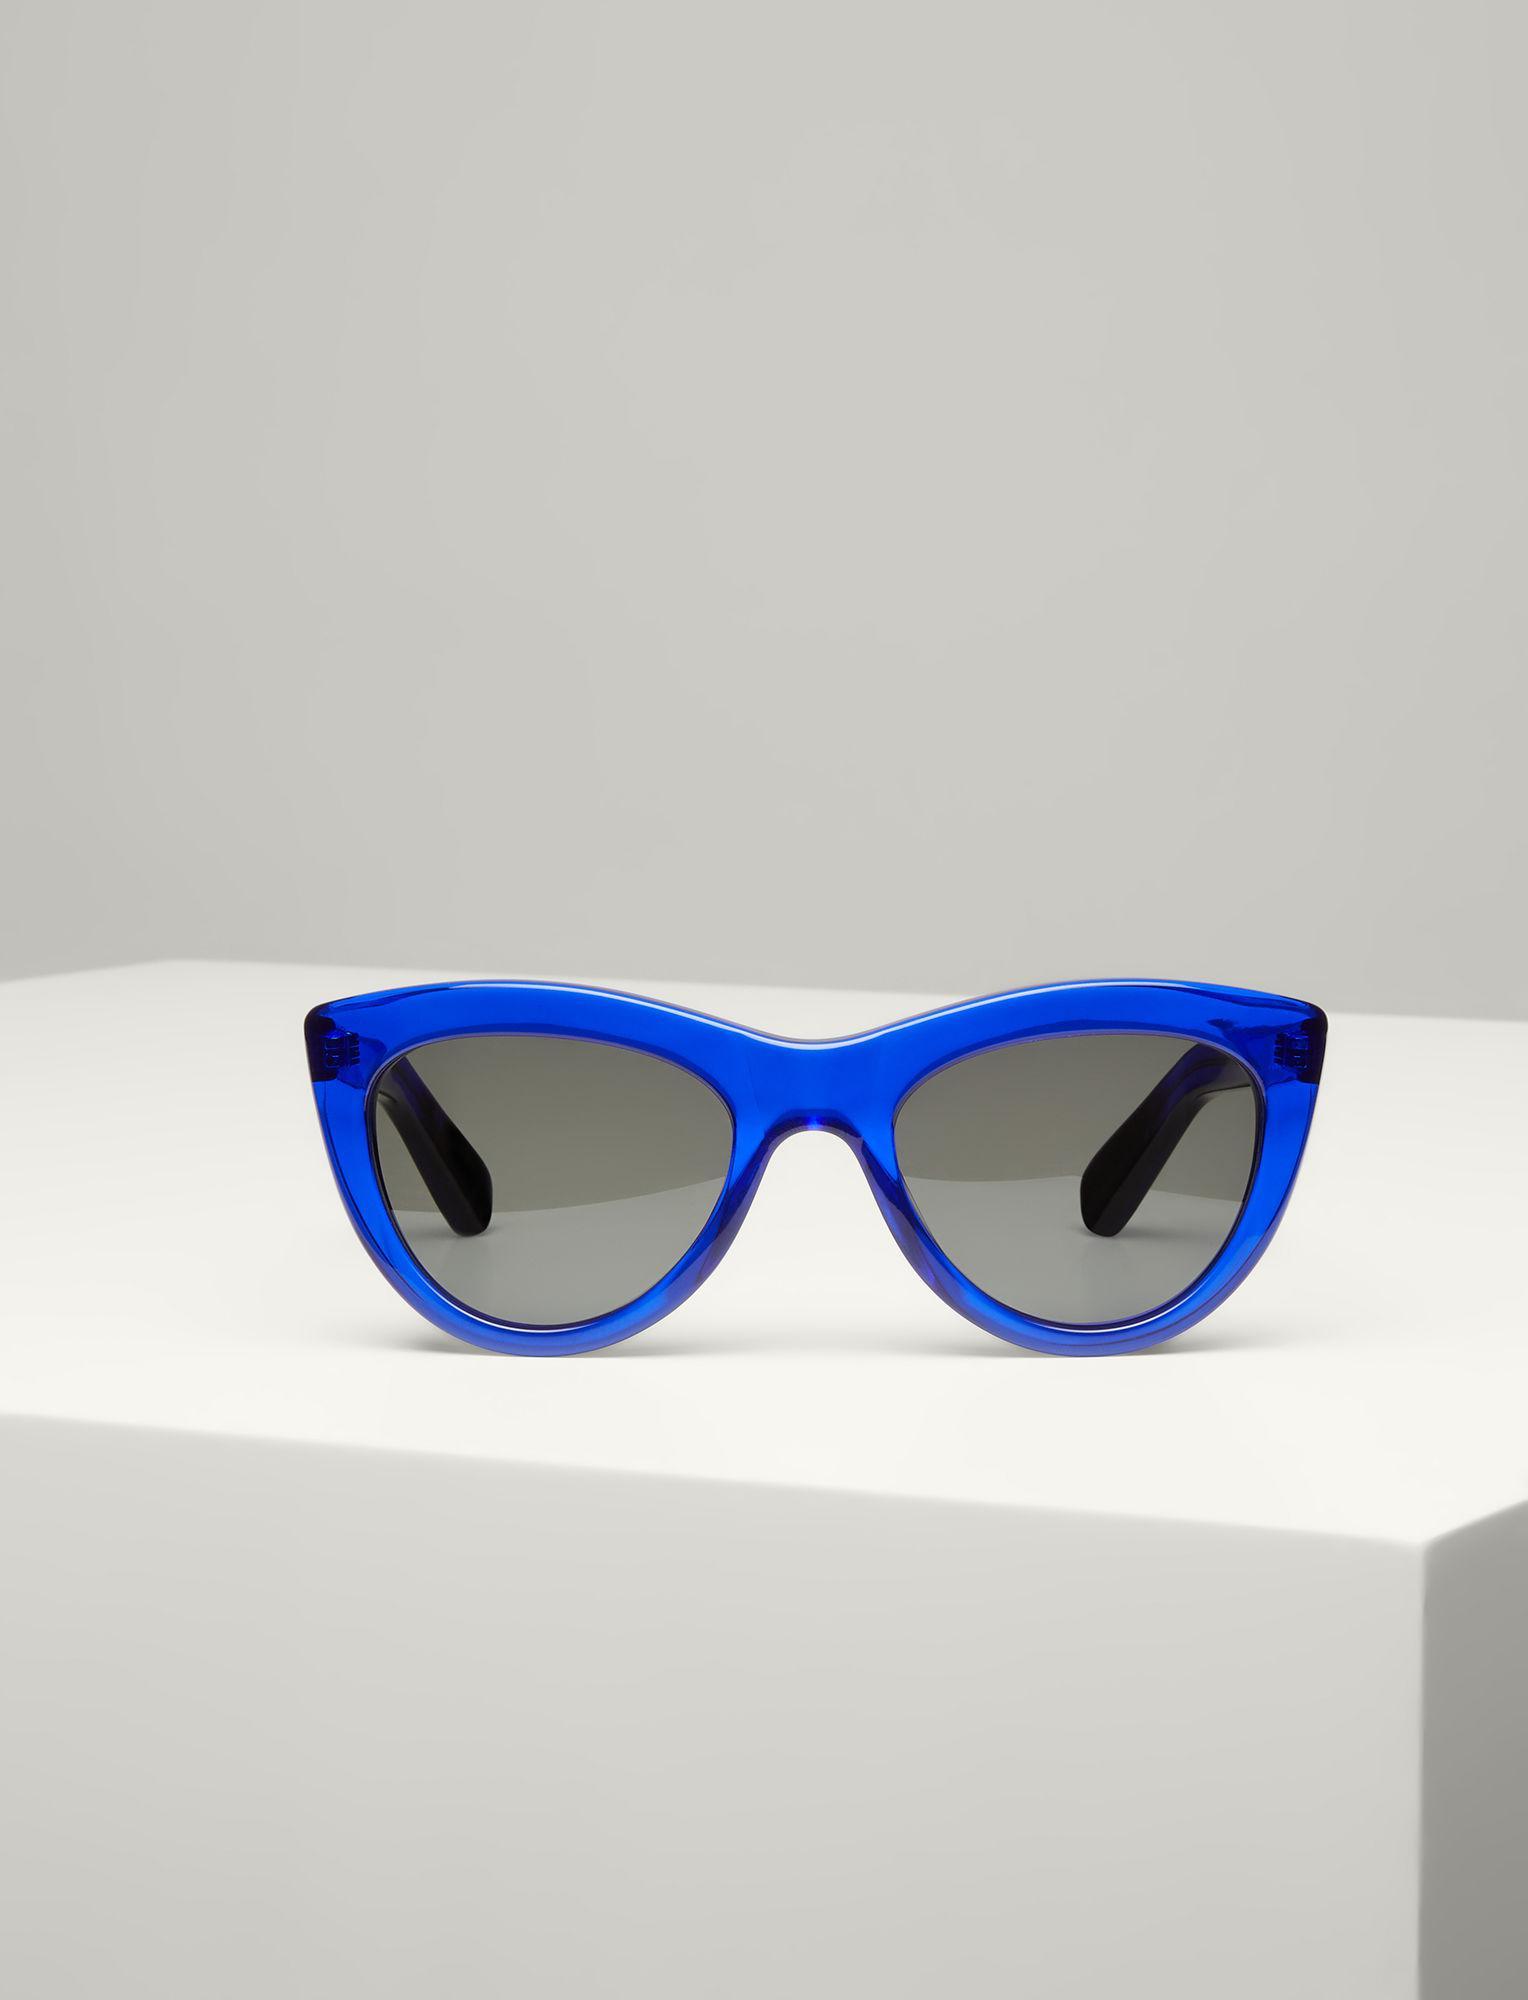 5d18dd31534a Joseph - Blue Montaigne Sunglasses - Lyst. View fullscreen